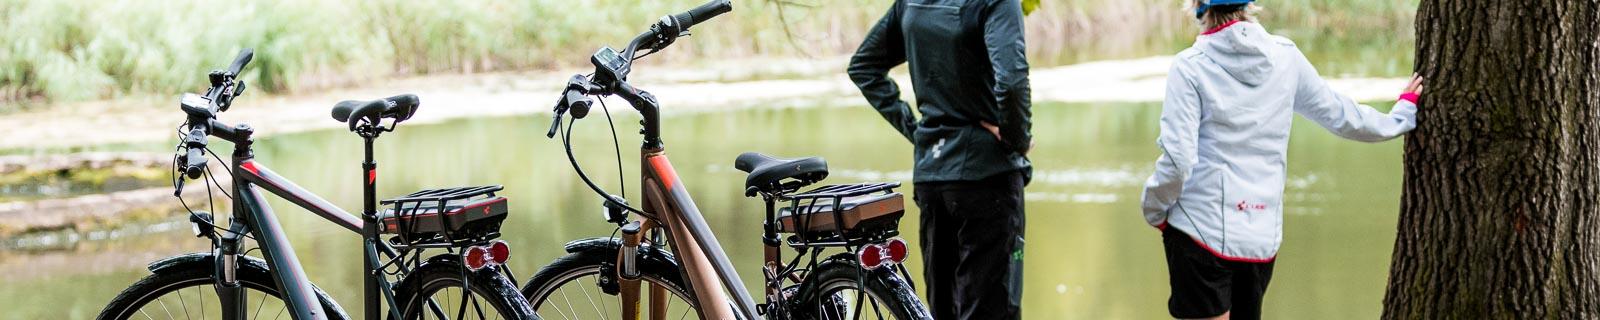 Das Trekkingrad als E-Bike